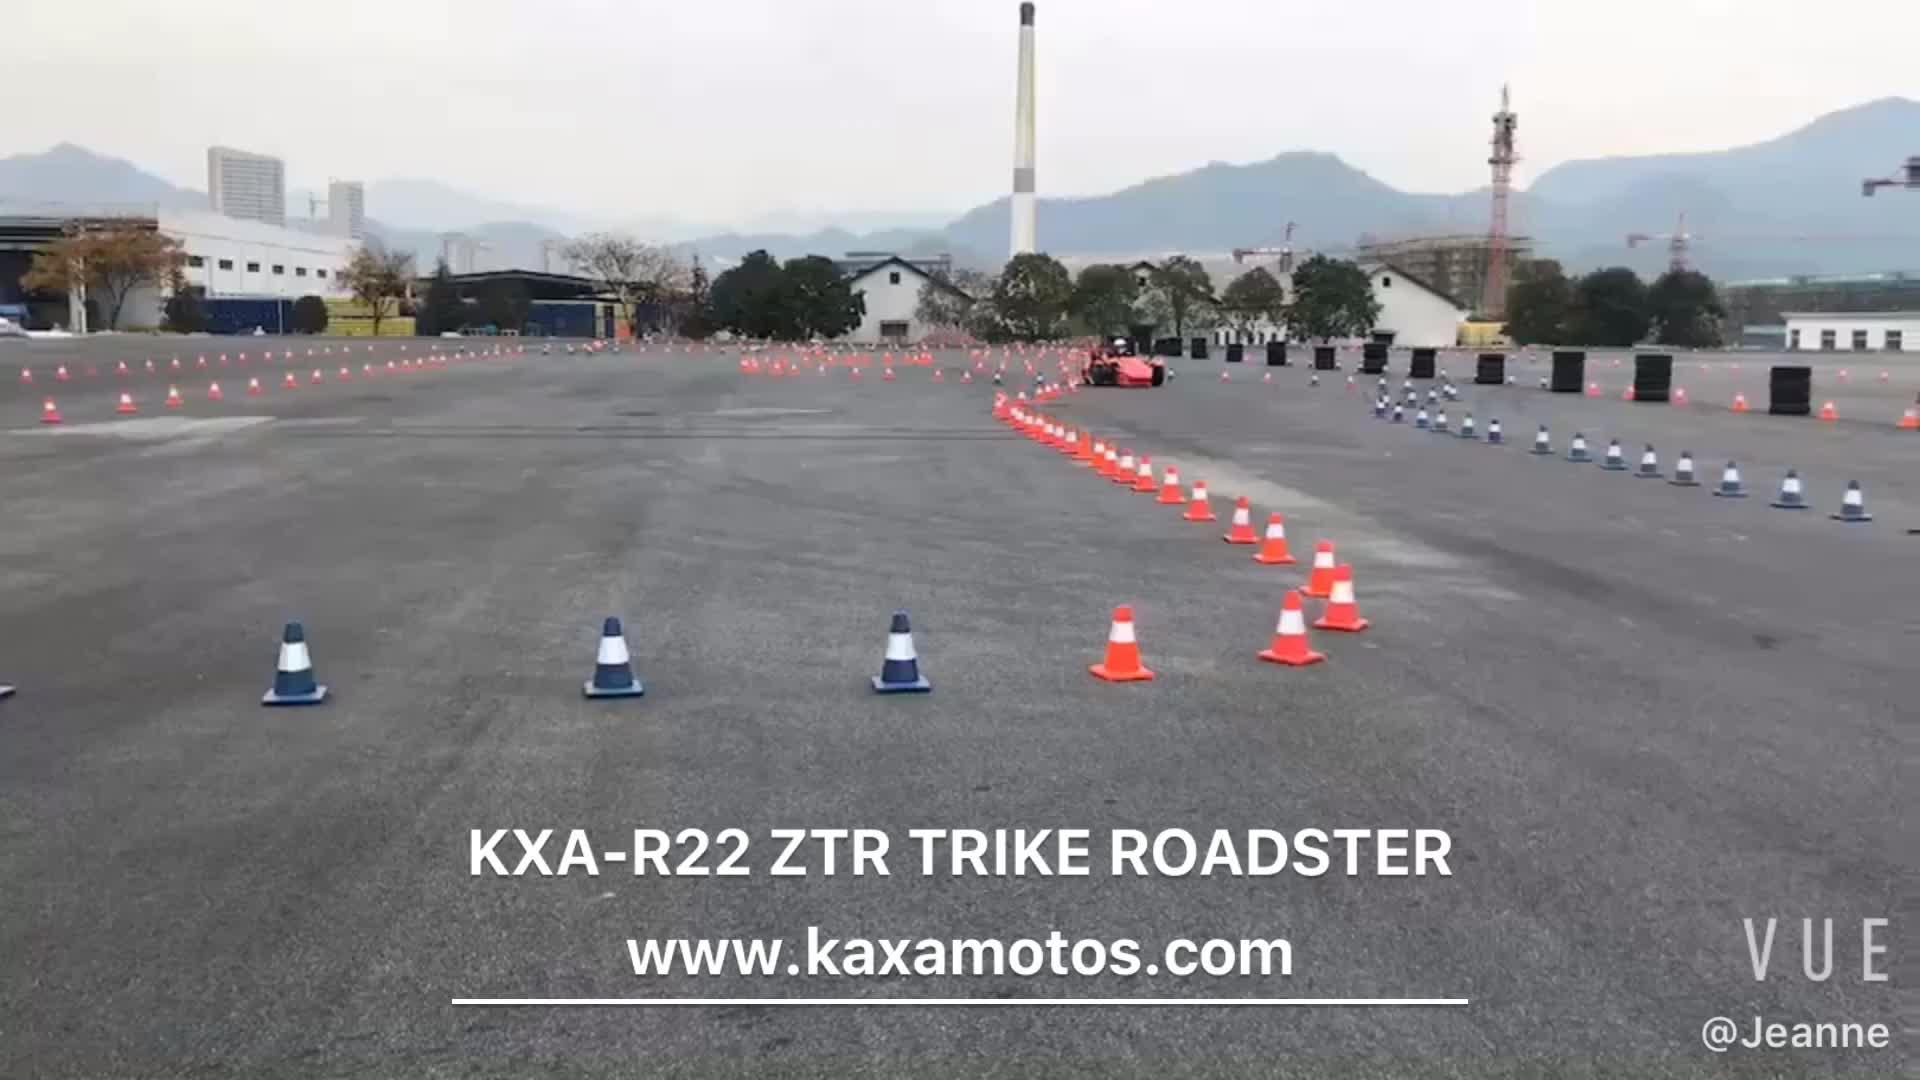 ZTR Trike Roadster 250cc מירוץ Trike טרקטורונים